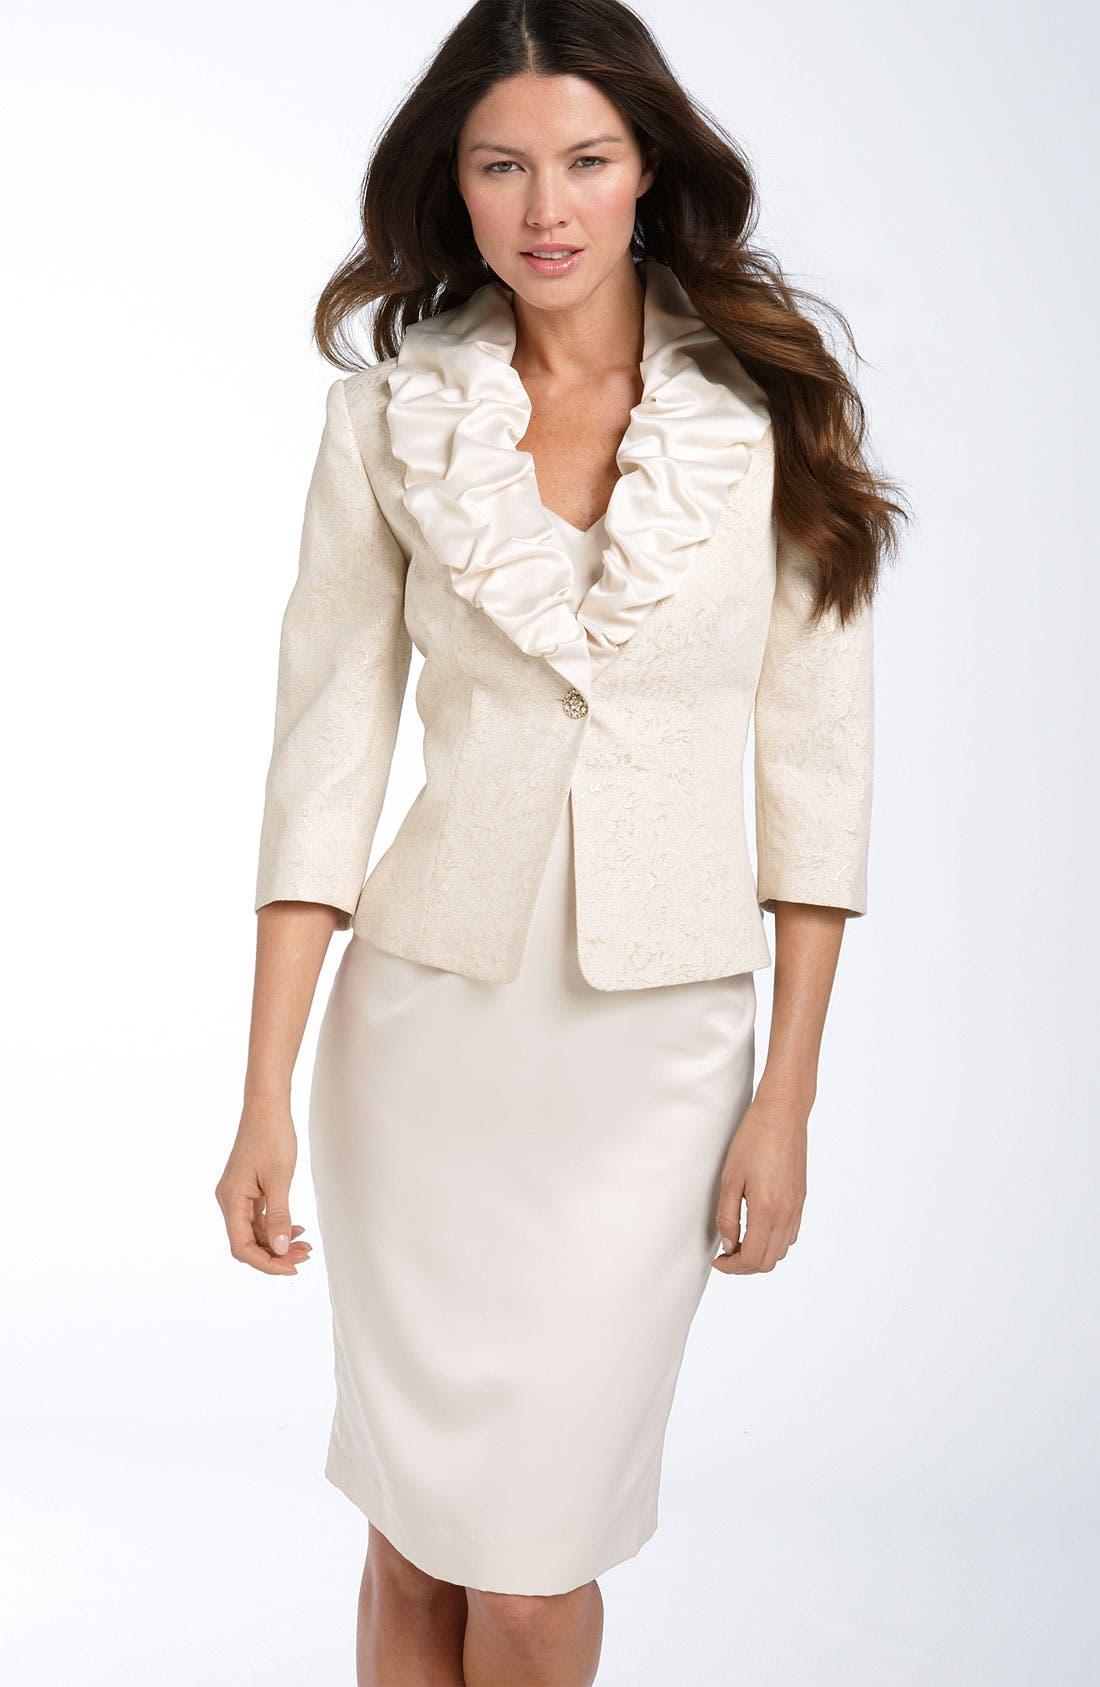 Main Image - Adrianna Papell Sheath Dress with Jacquard Jacket